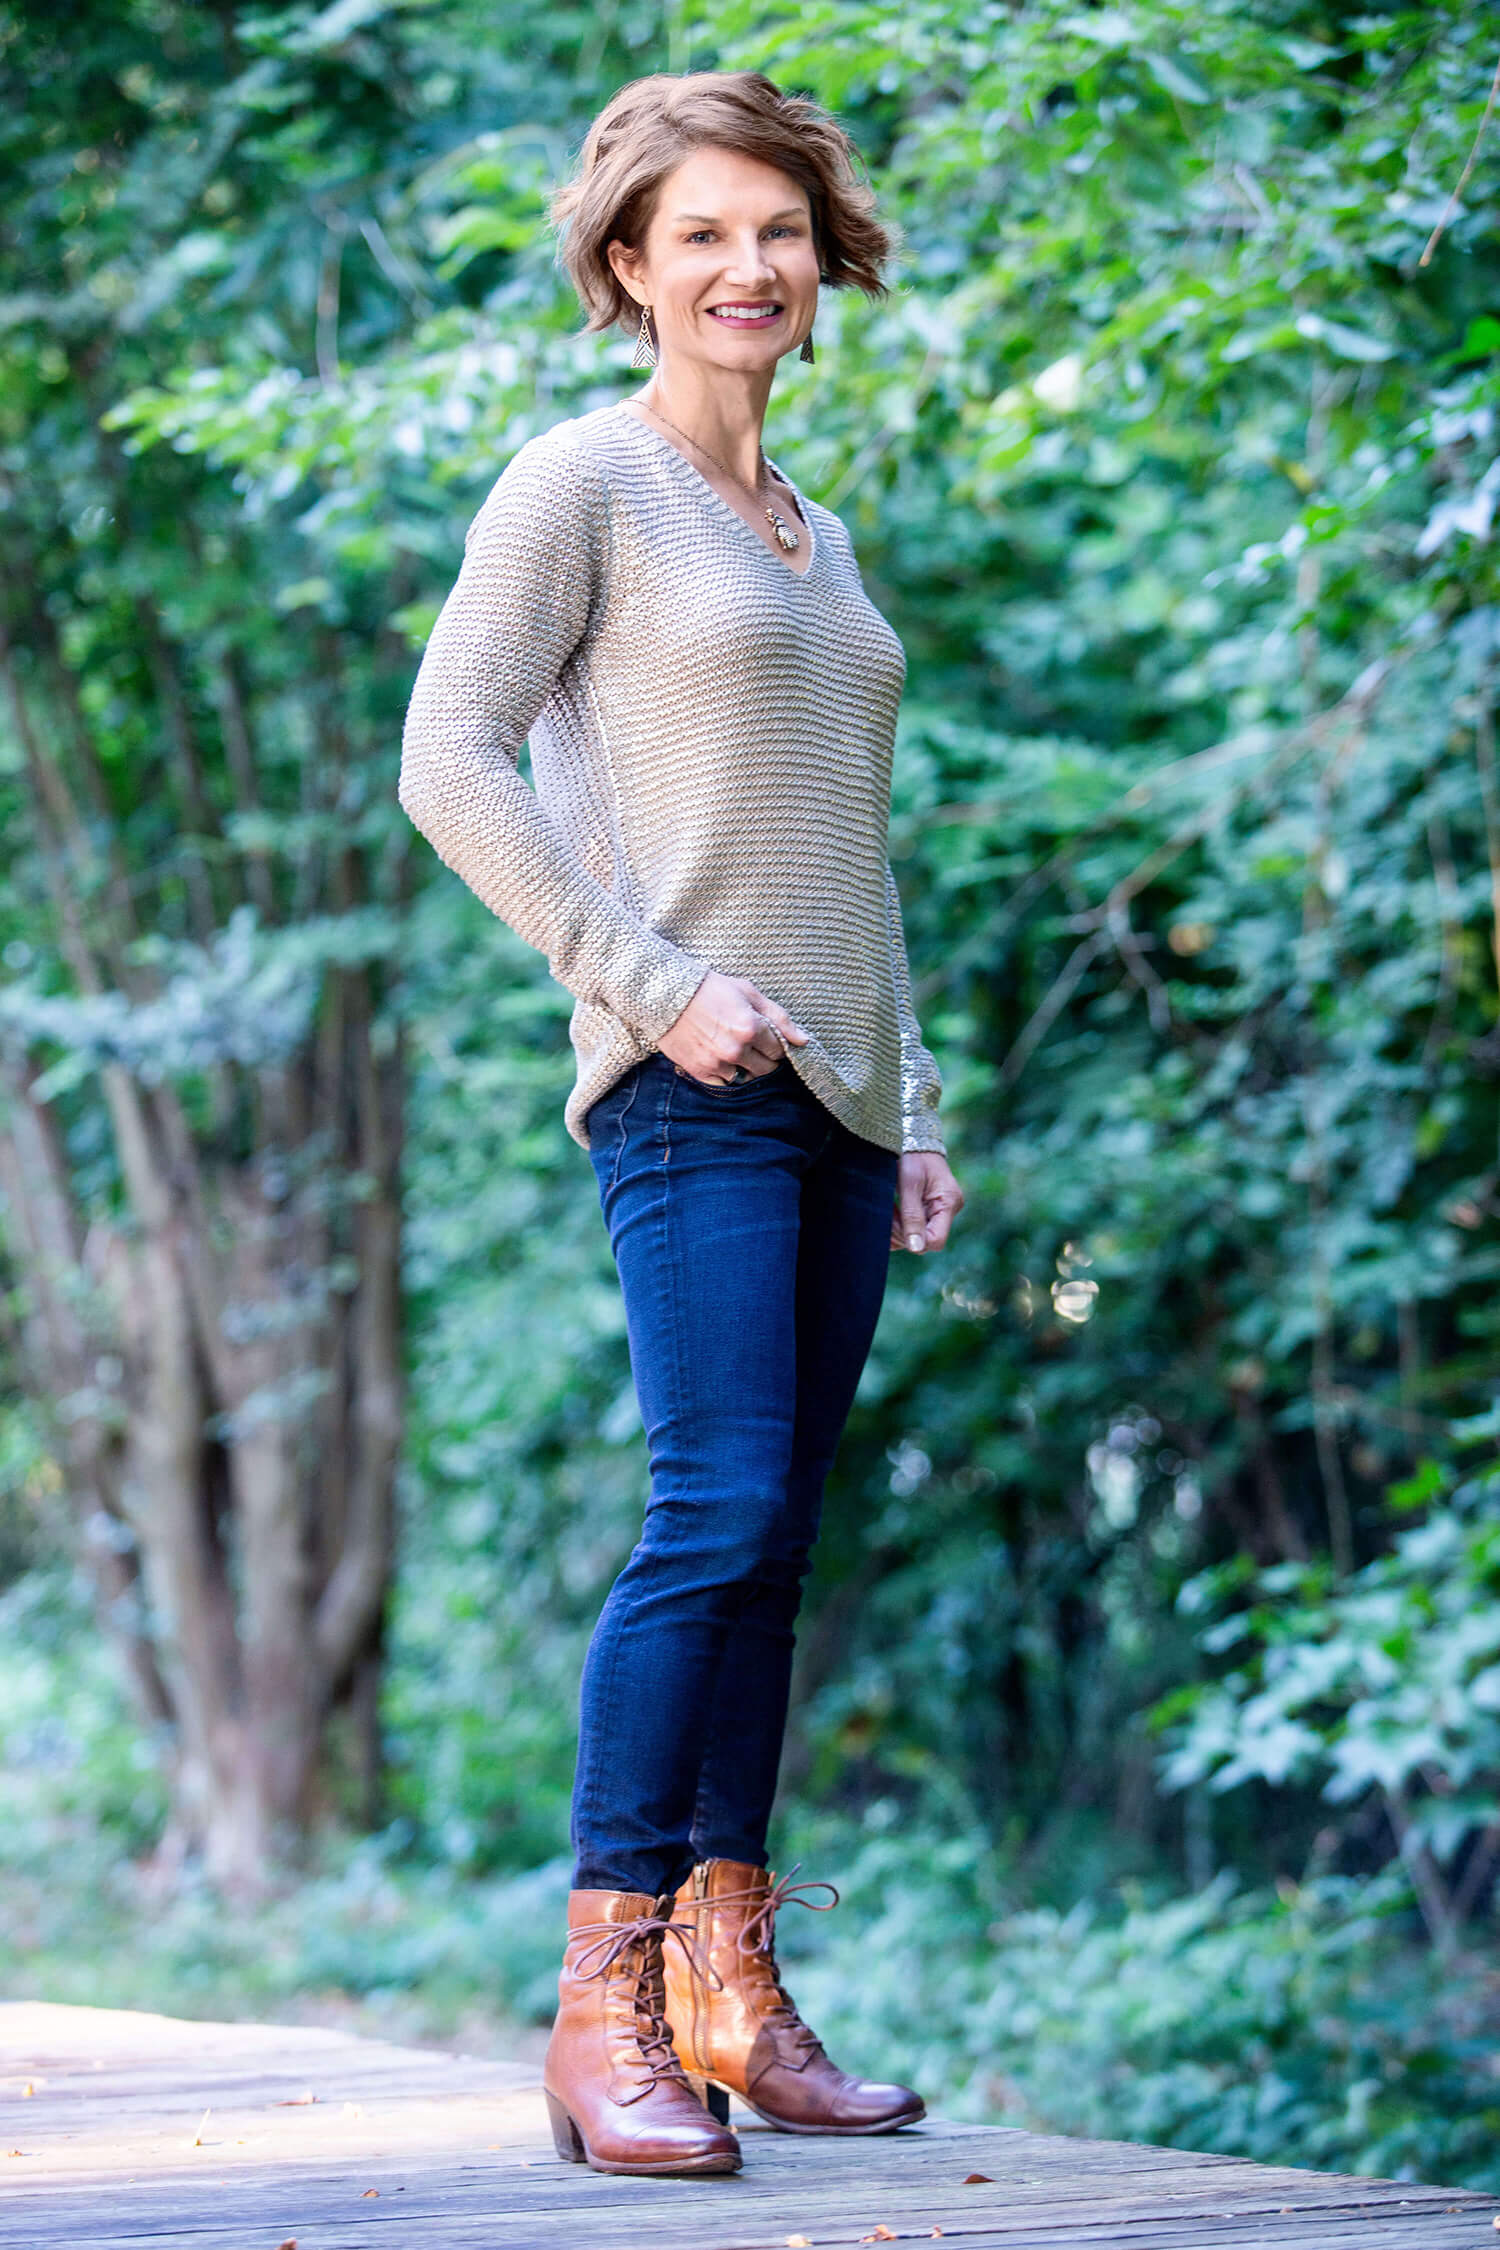 Marcey-Full-body-shot-in-sweater